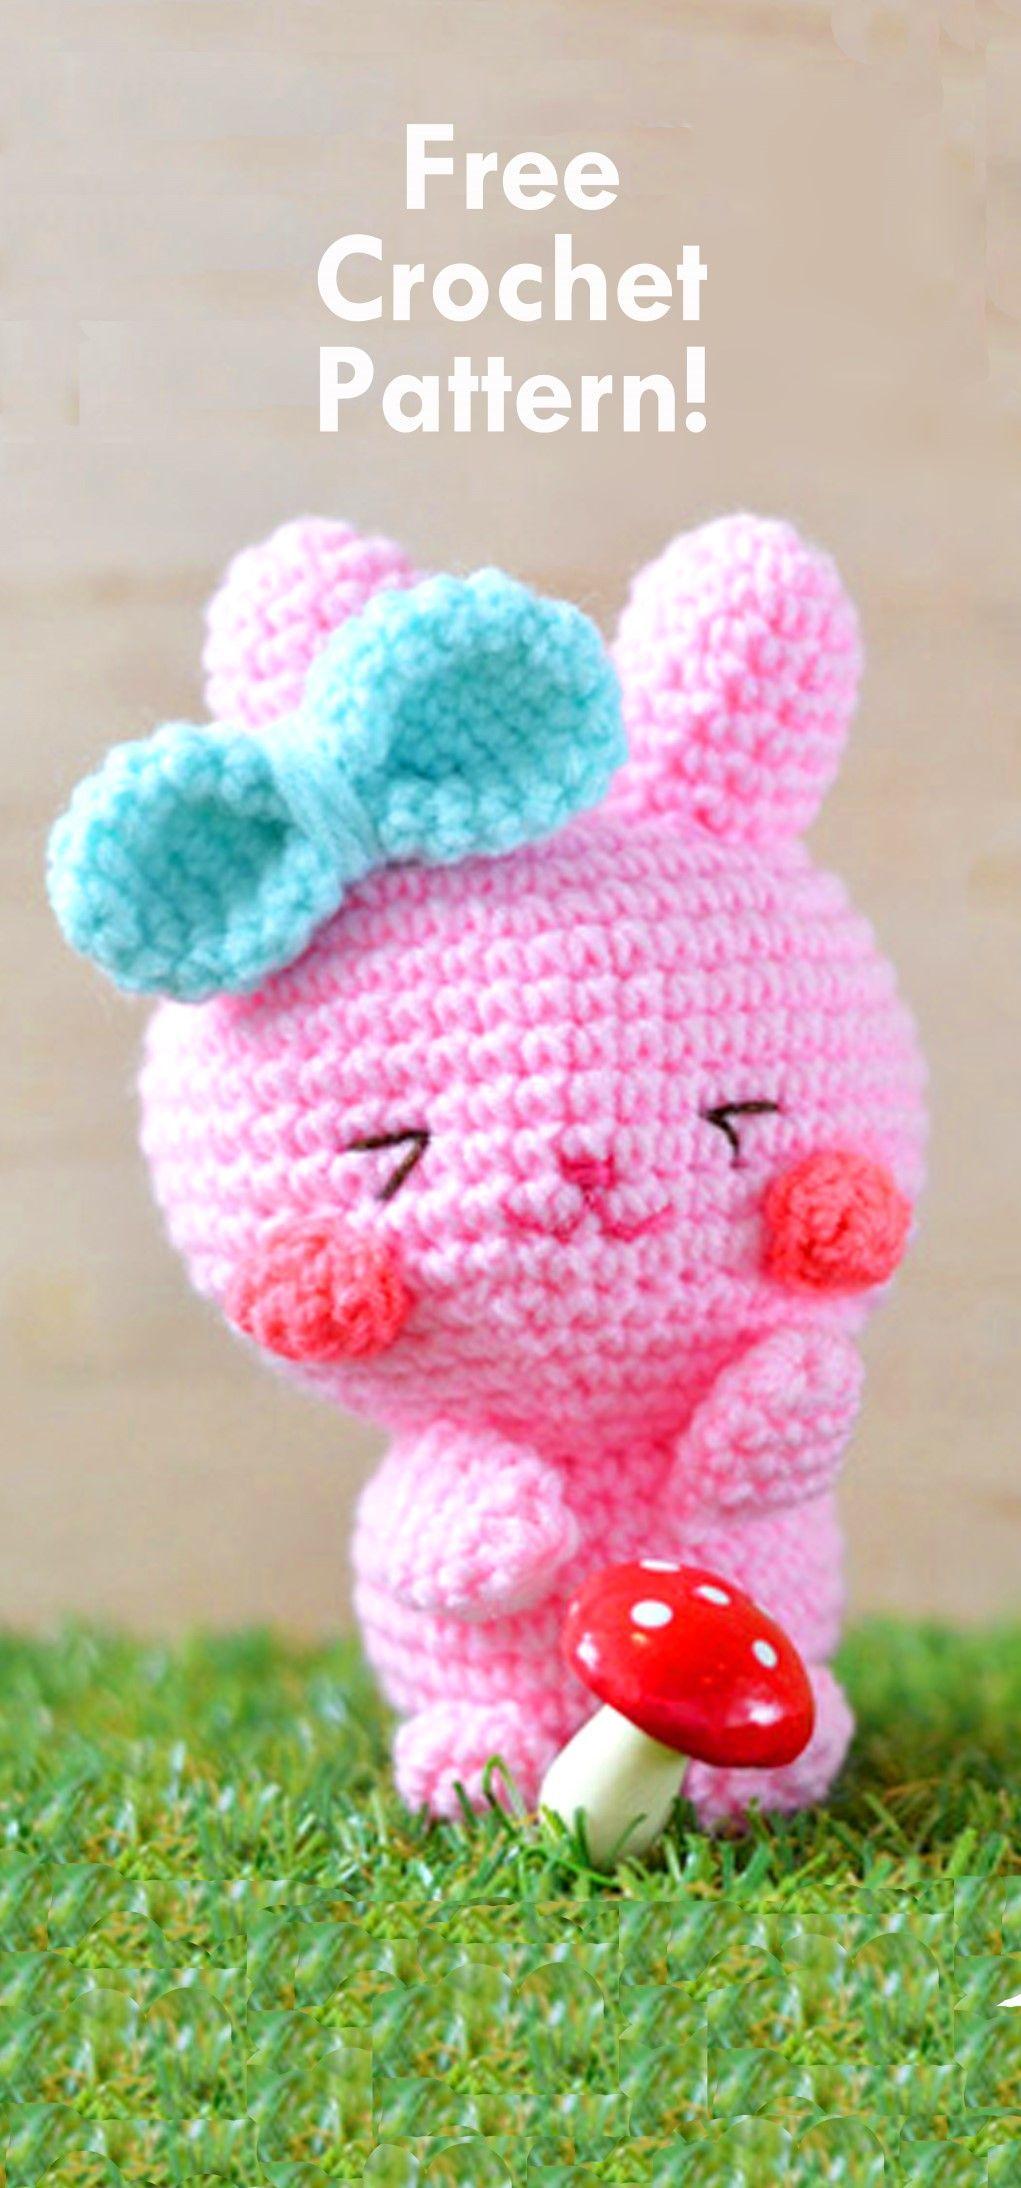 Easter Bunnies: Free Crochet Patterns!   Easter bunny crochet ...